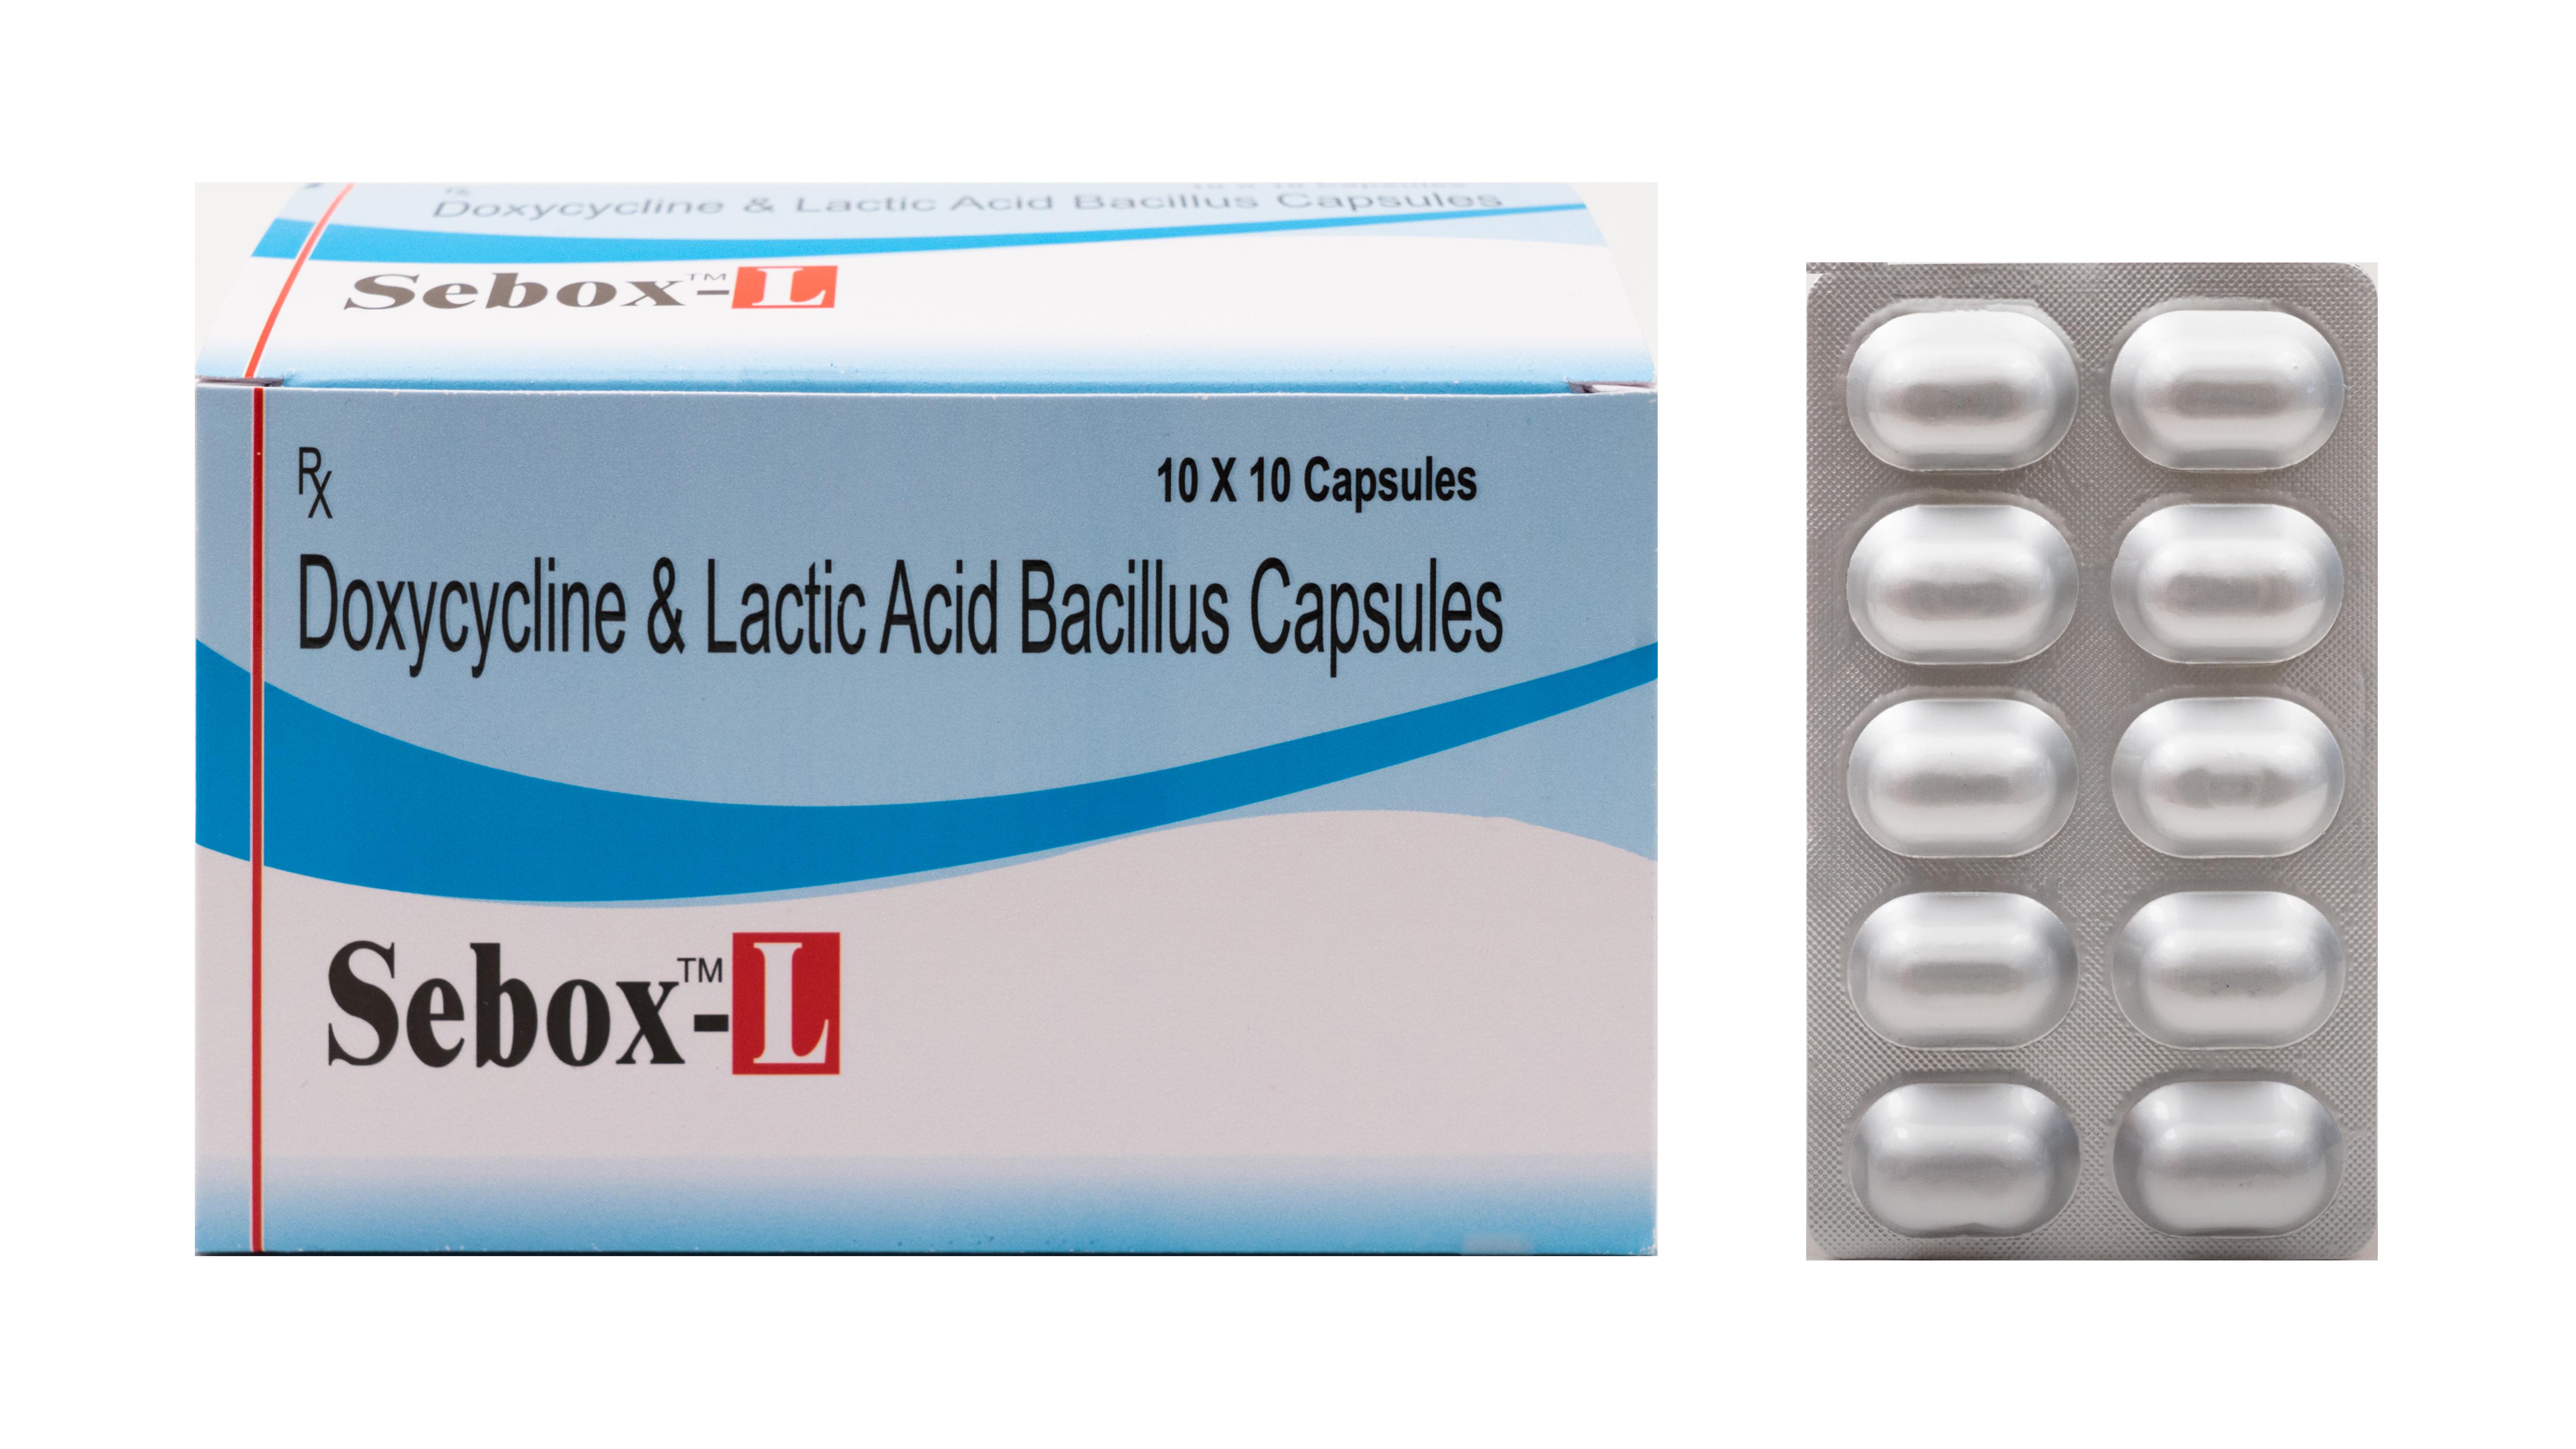 Doxycycline hydrochloride Cap ( Sebox-L )